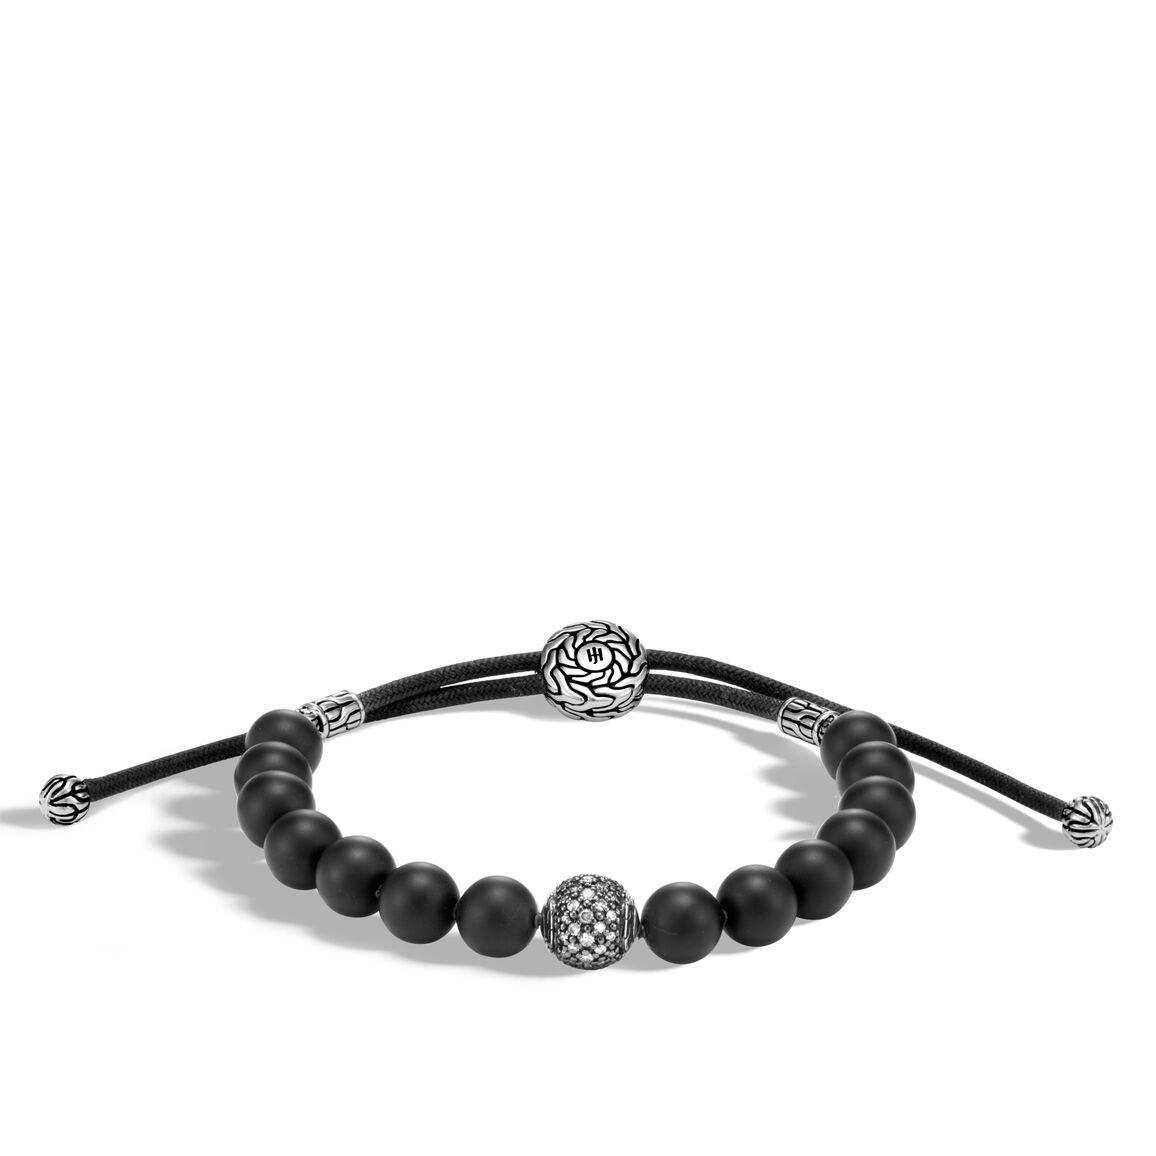 Classic Chain Bead Bracelet, Silver with Gemstone, Diamonds